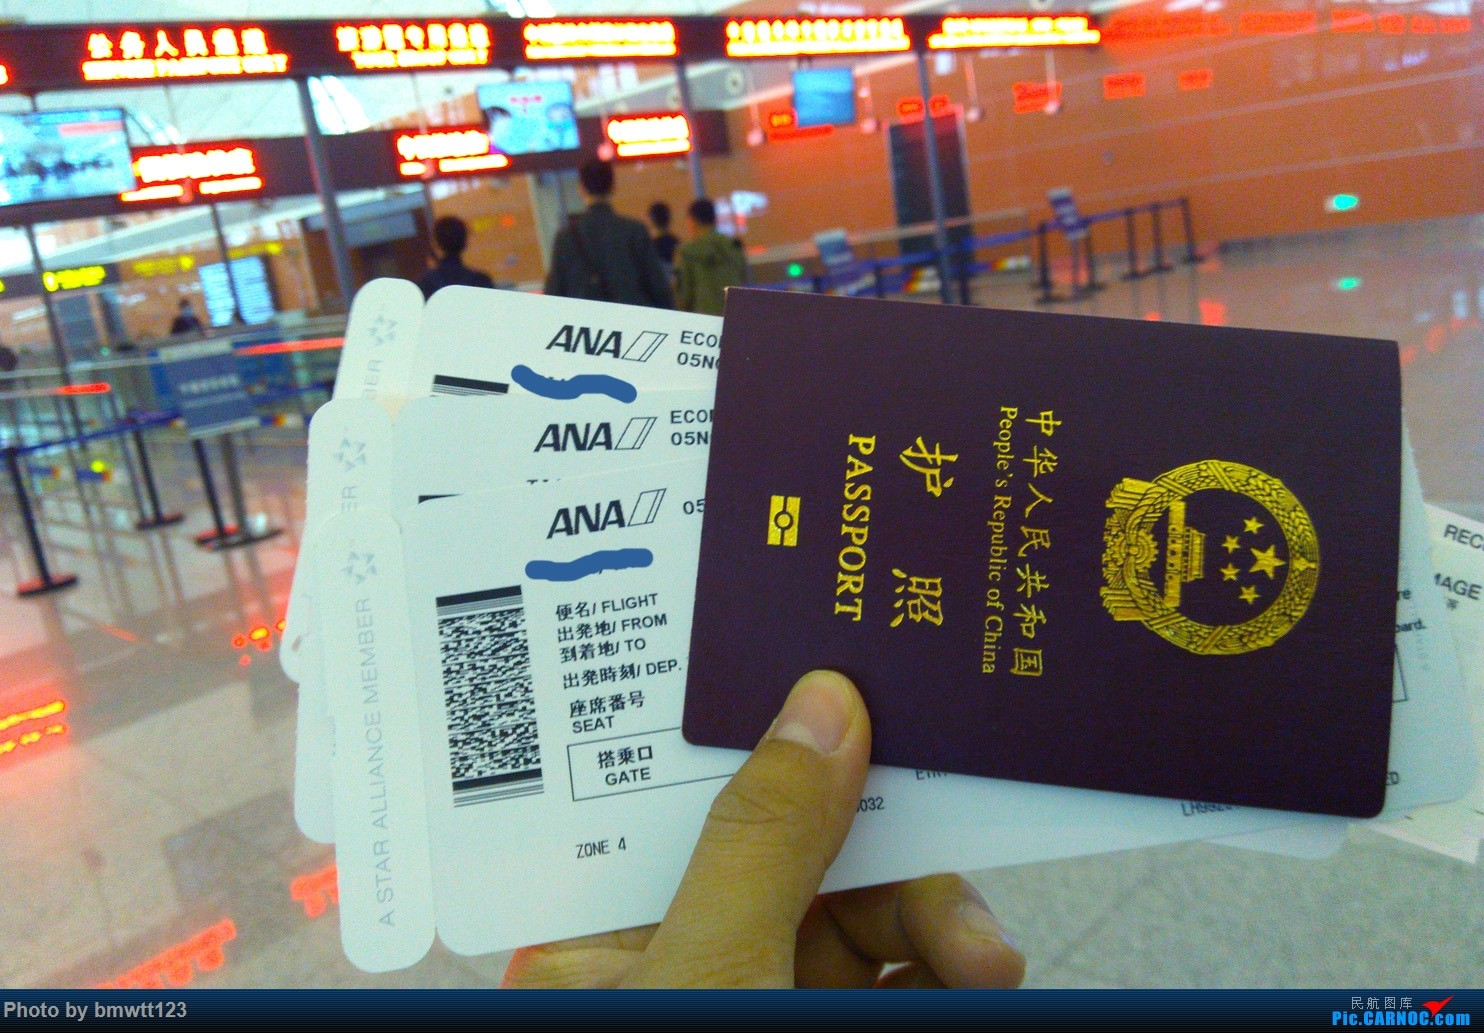 Re:[原创]【SHE沈阳-NRT成田】NH926解锁ANA767-300,遗憾!没来得及去观景台 767-300 JA610A 中国沈阳桃仙国际机场